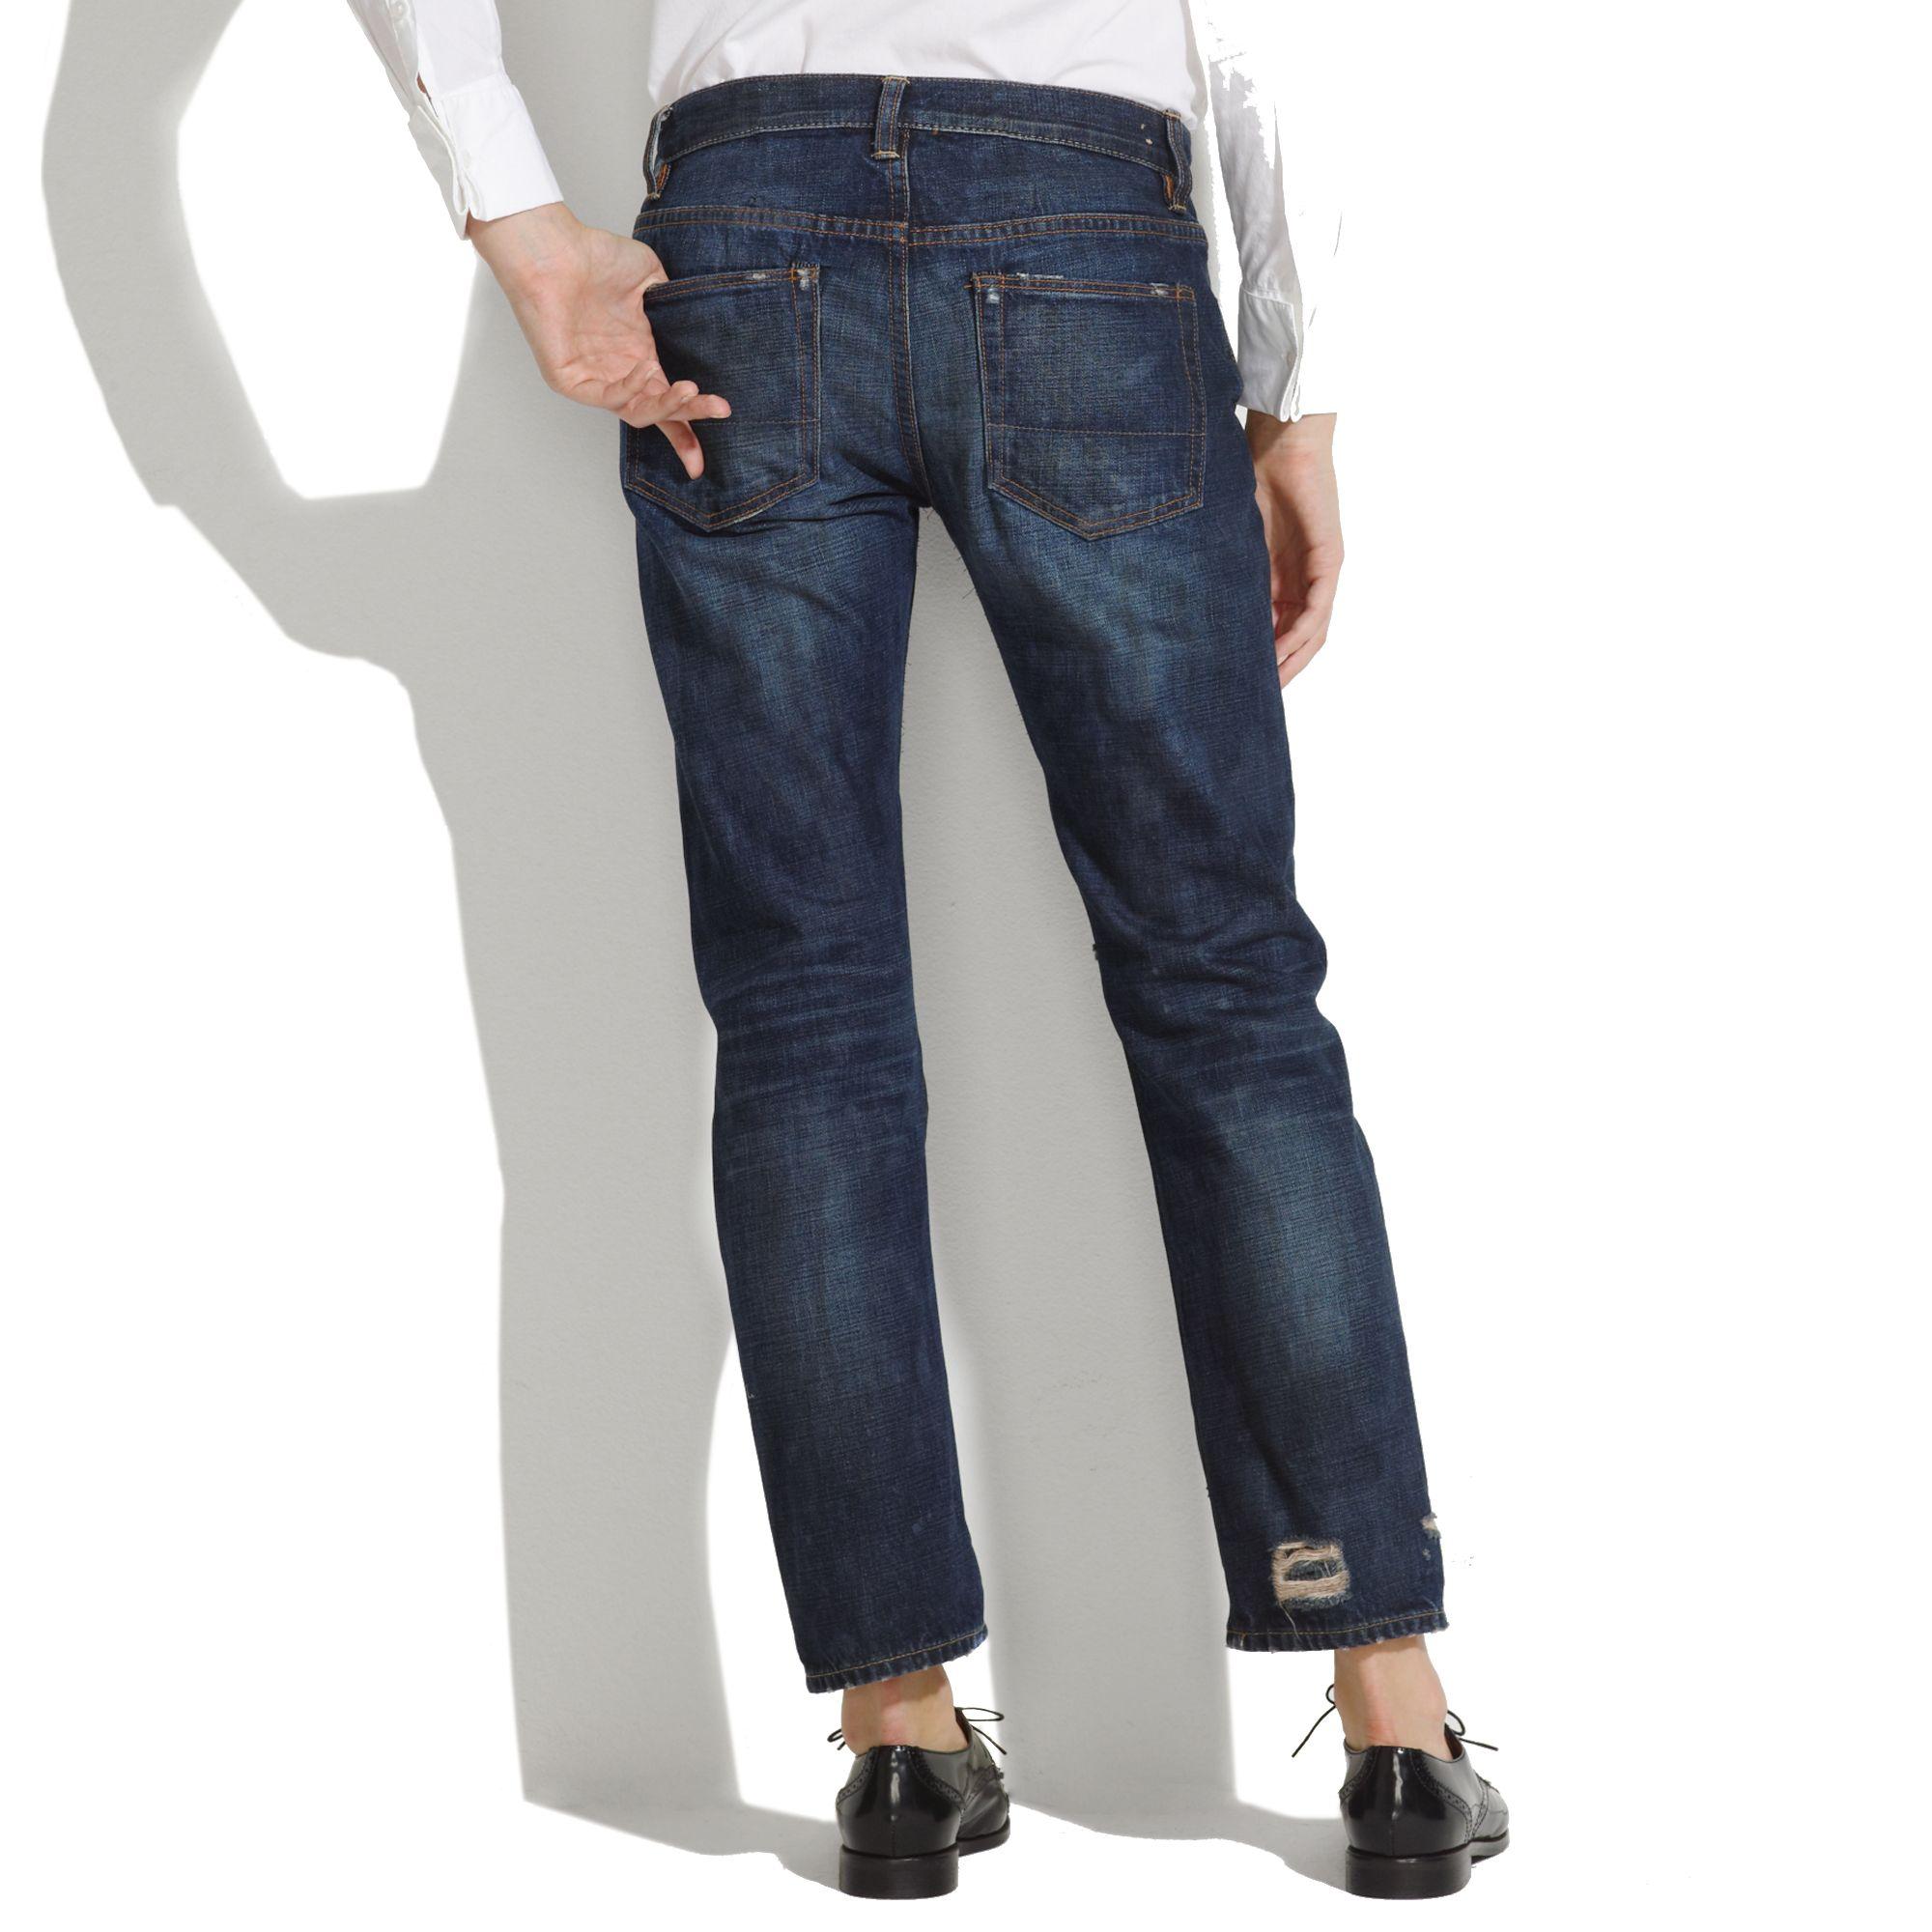 Madewell Nsfreg Beck Boyfriend Jeans in Blue